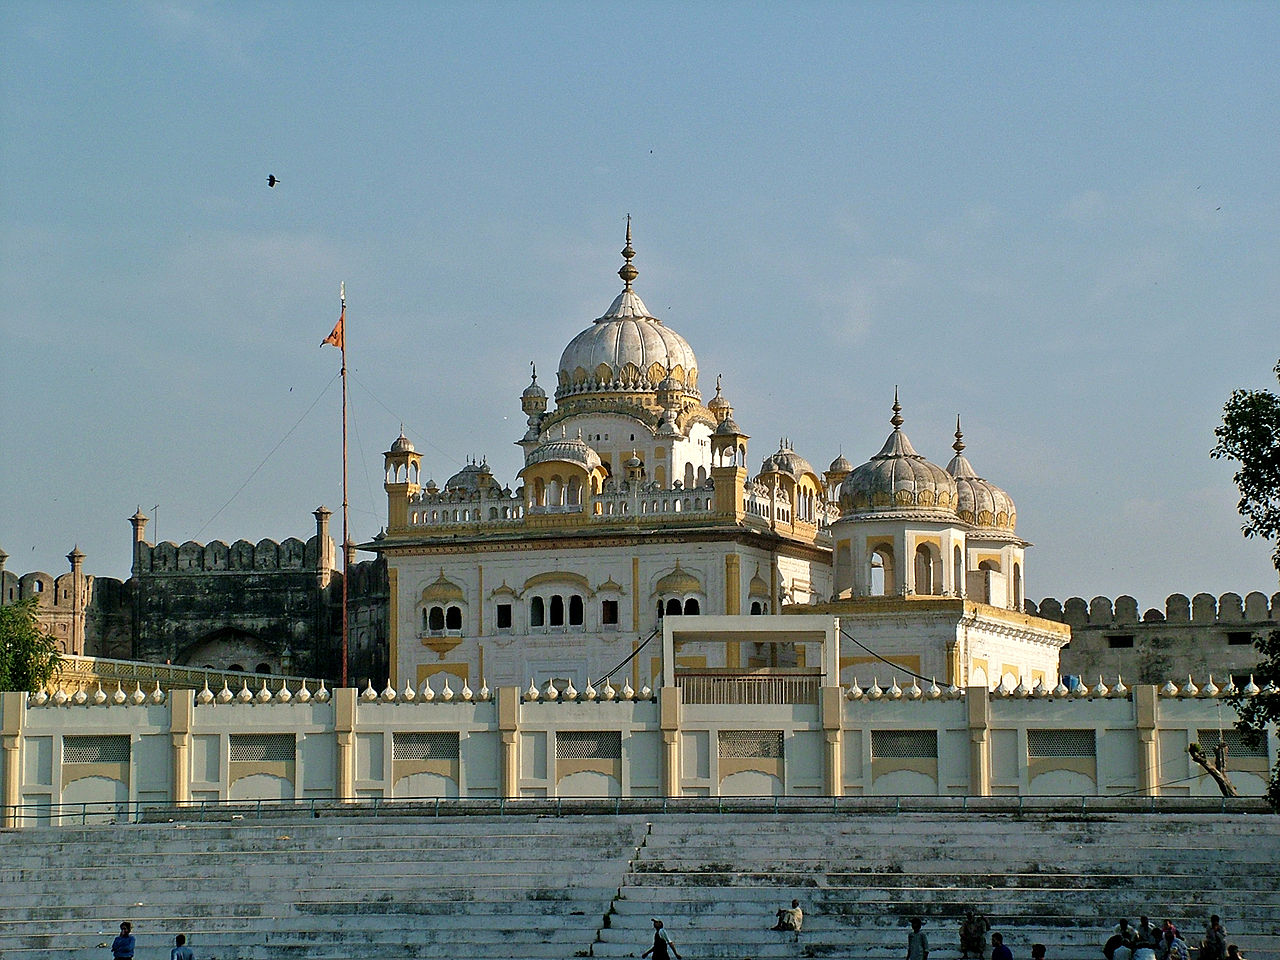 File:Tomb of Ranjit Singh, Lahore.jpg - Wikipedia